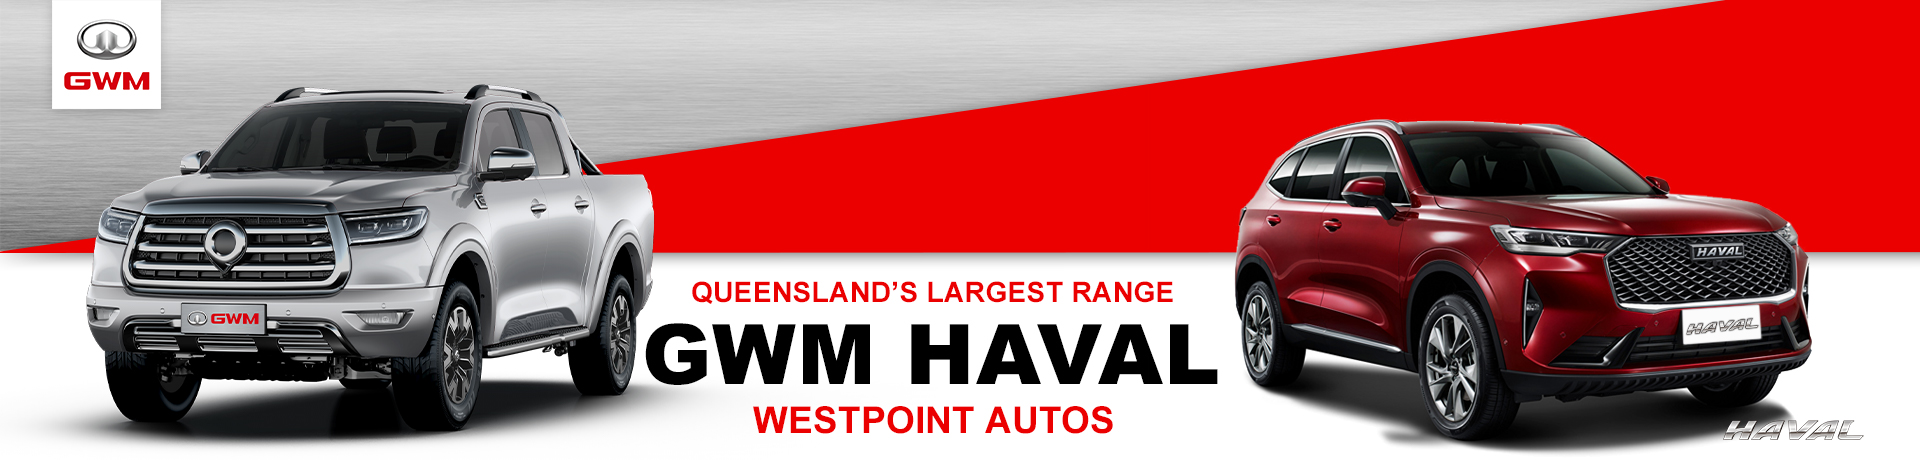 Queensland's largest range of GWM Haval Vehicles